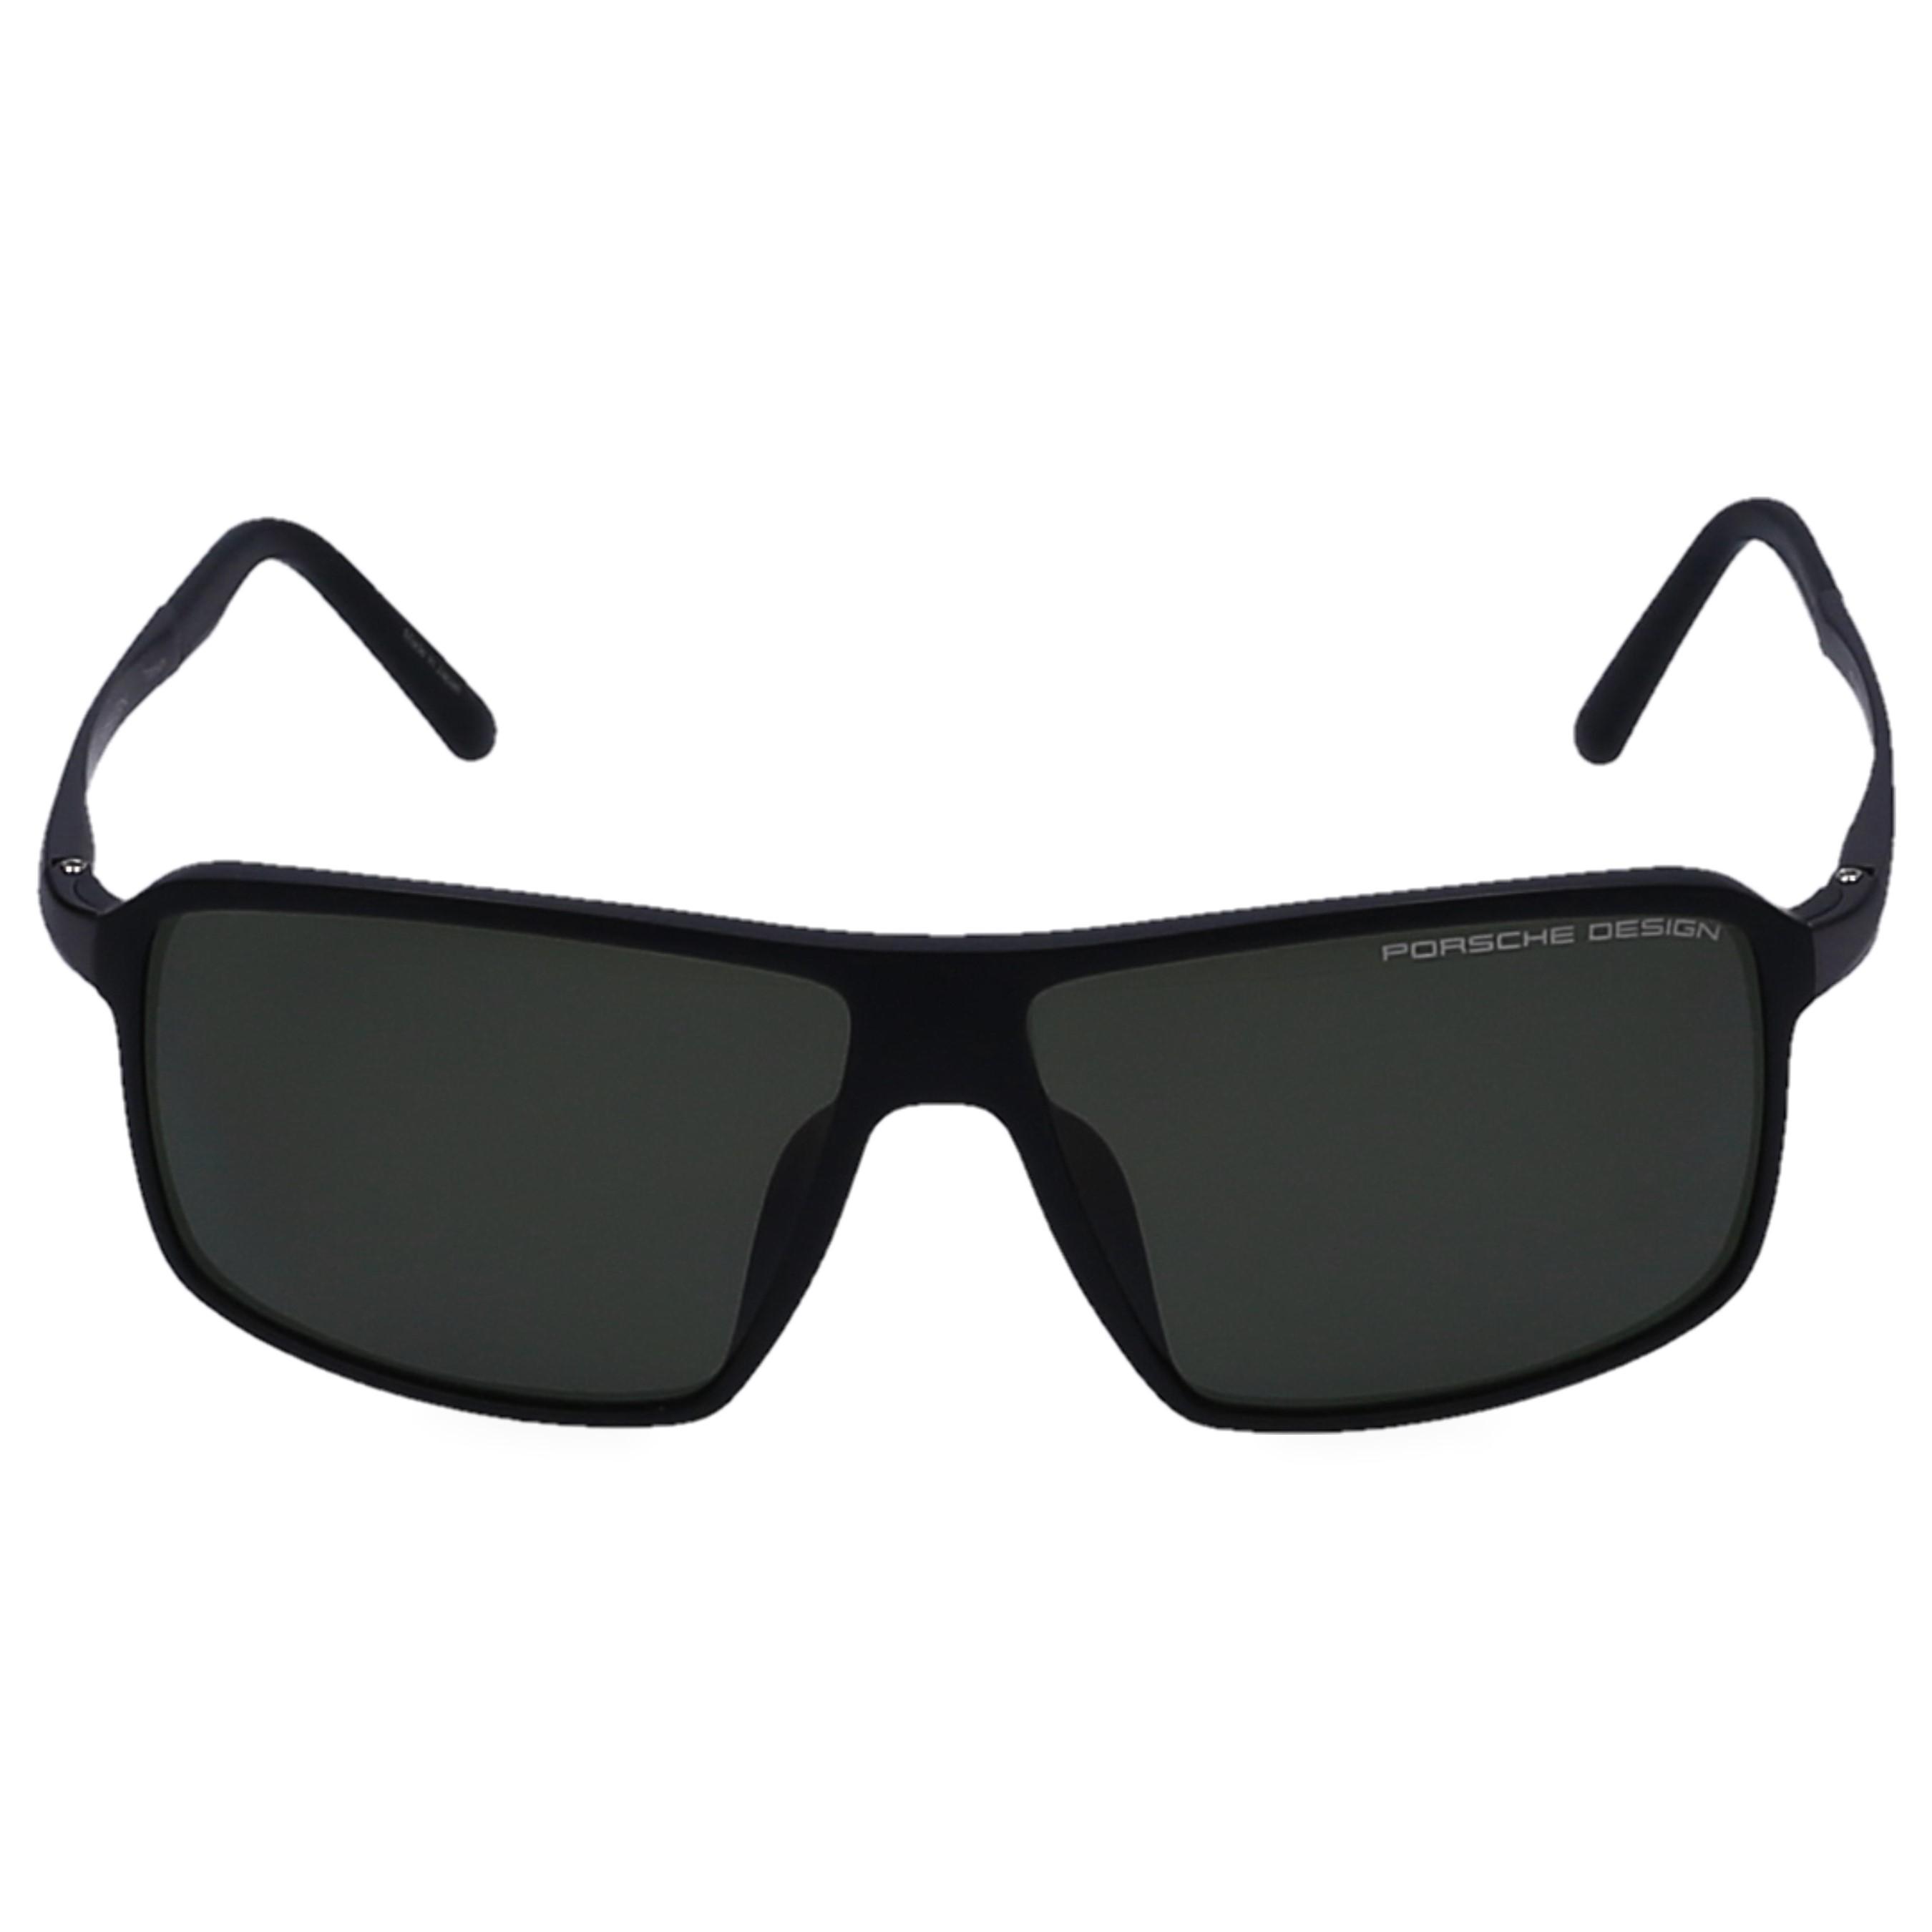 55a2cdb84be Porsche Design - White Men Sunglasses Wayfarer 8650 Actetate Black for Men  - Lyst. View fullscreen